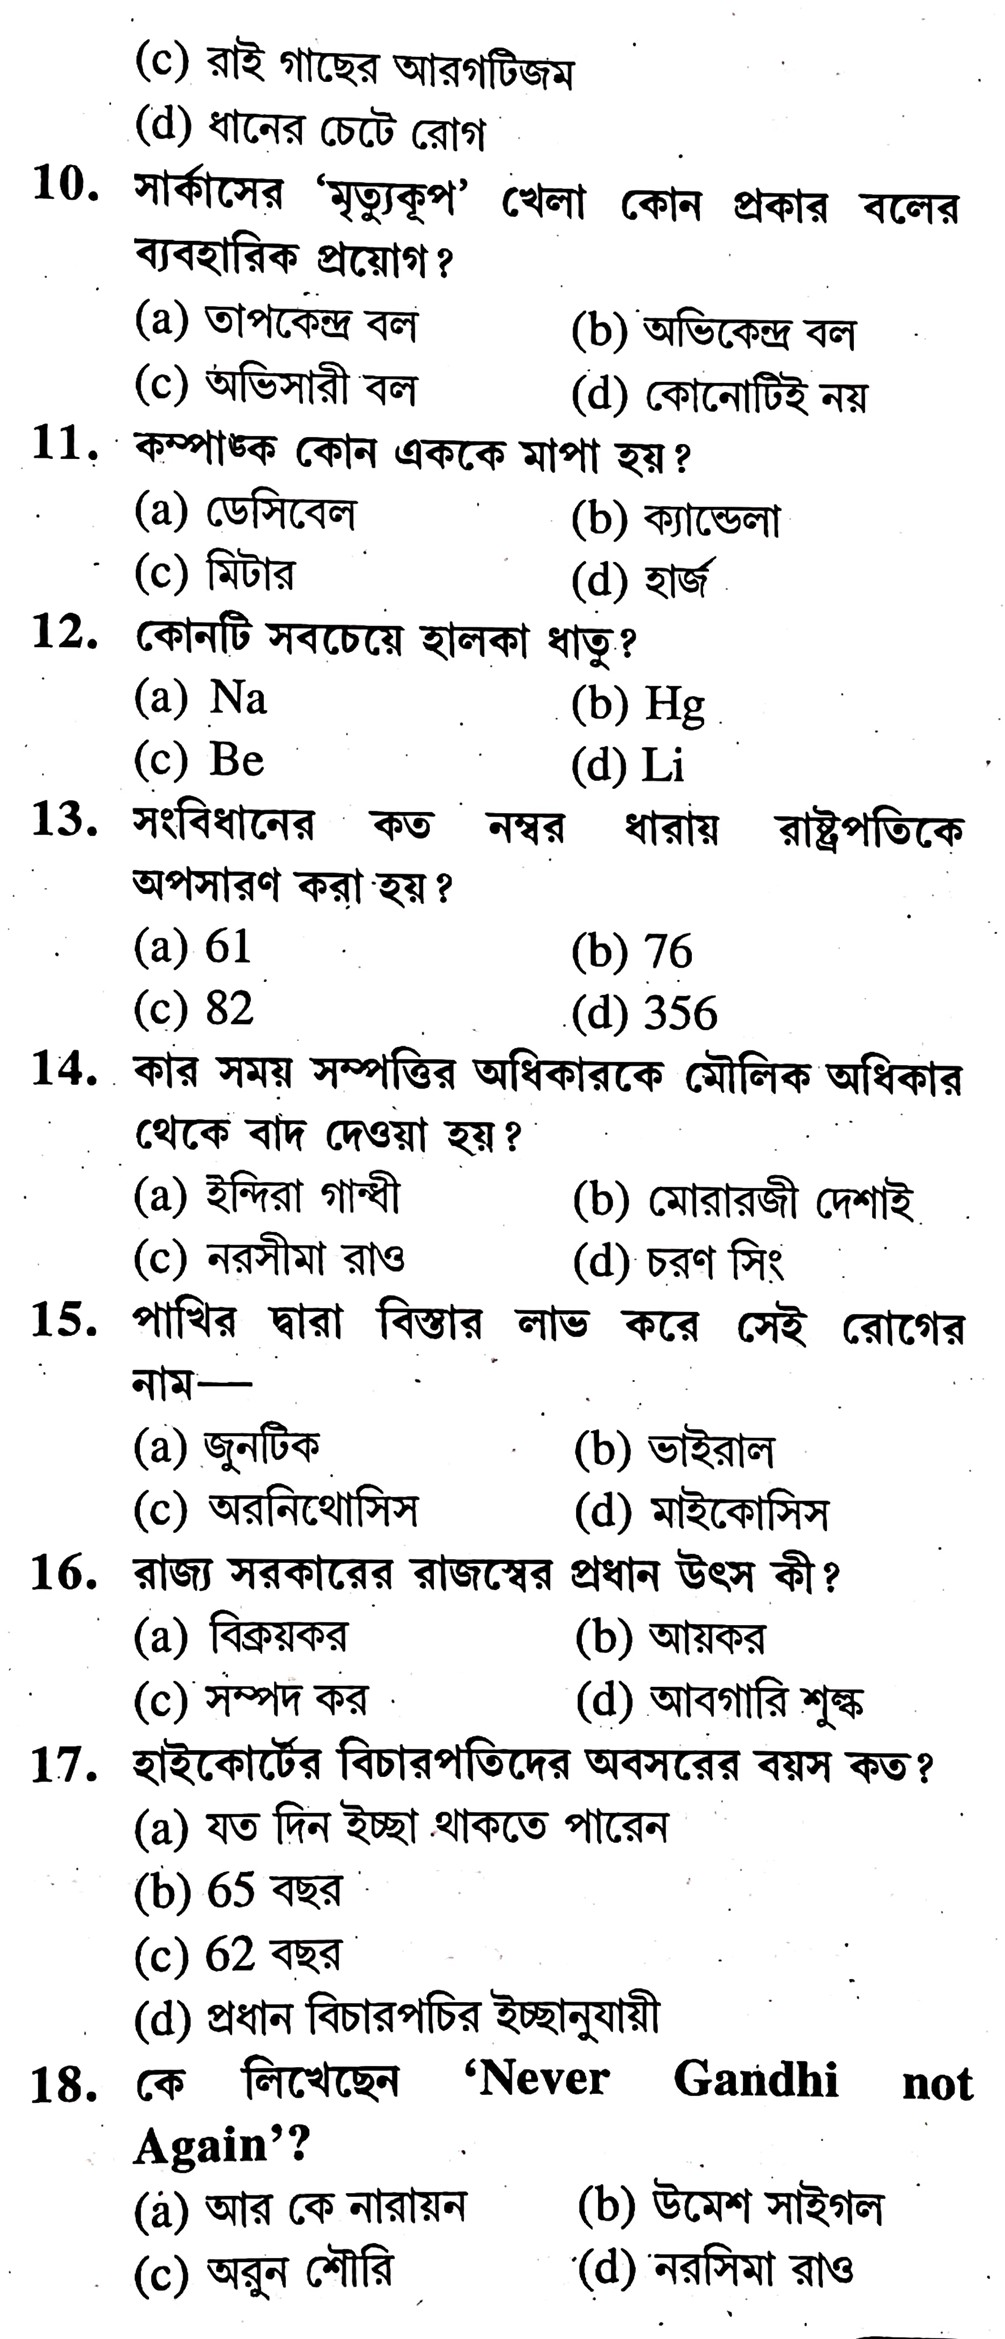 West Bengal Police Constable Preliminary Practice Set - 13 In Bengali || পশ্চিমবঙ্গ পুলিশ কনস্টেবল প্রিলিমিনারী প্র্যাকটিস সেট -১৩ - WBCS Notebook